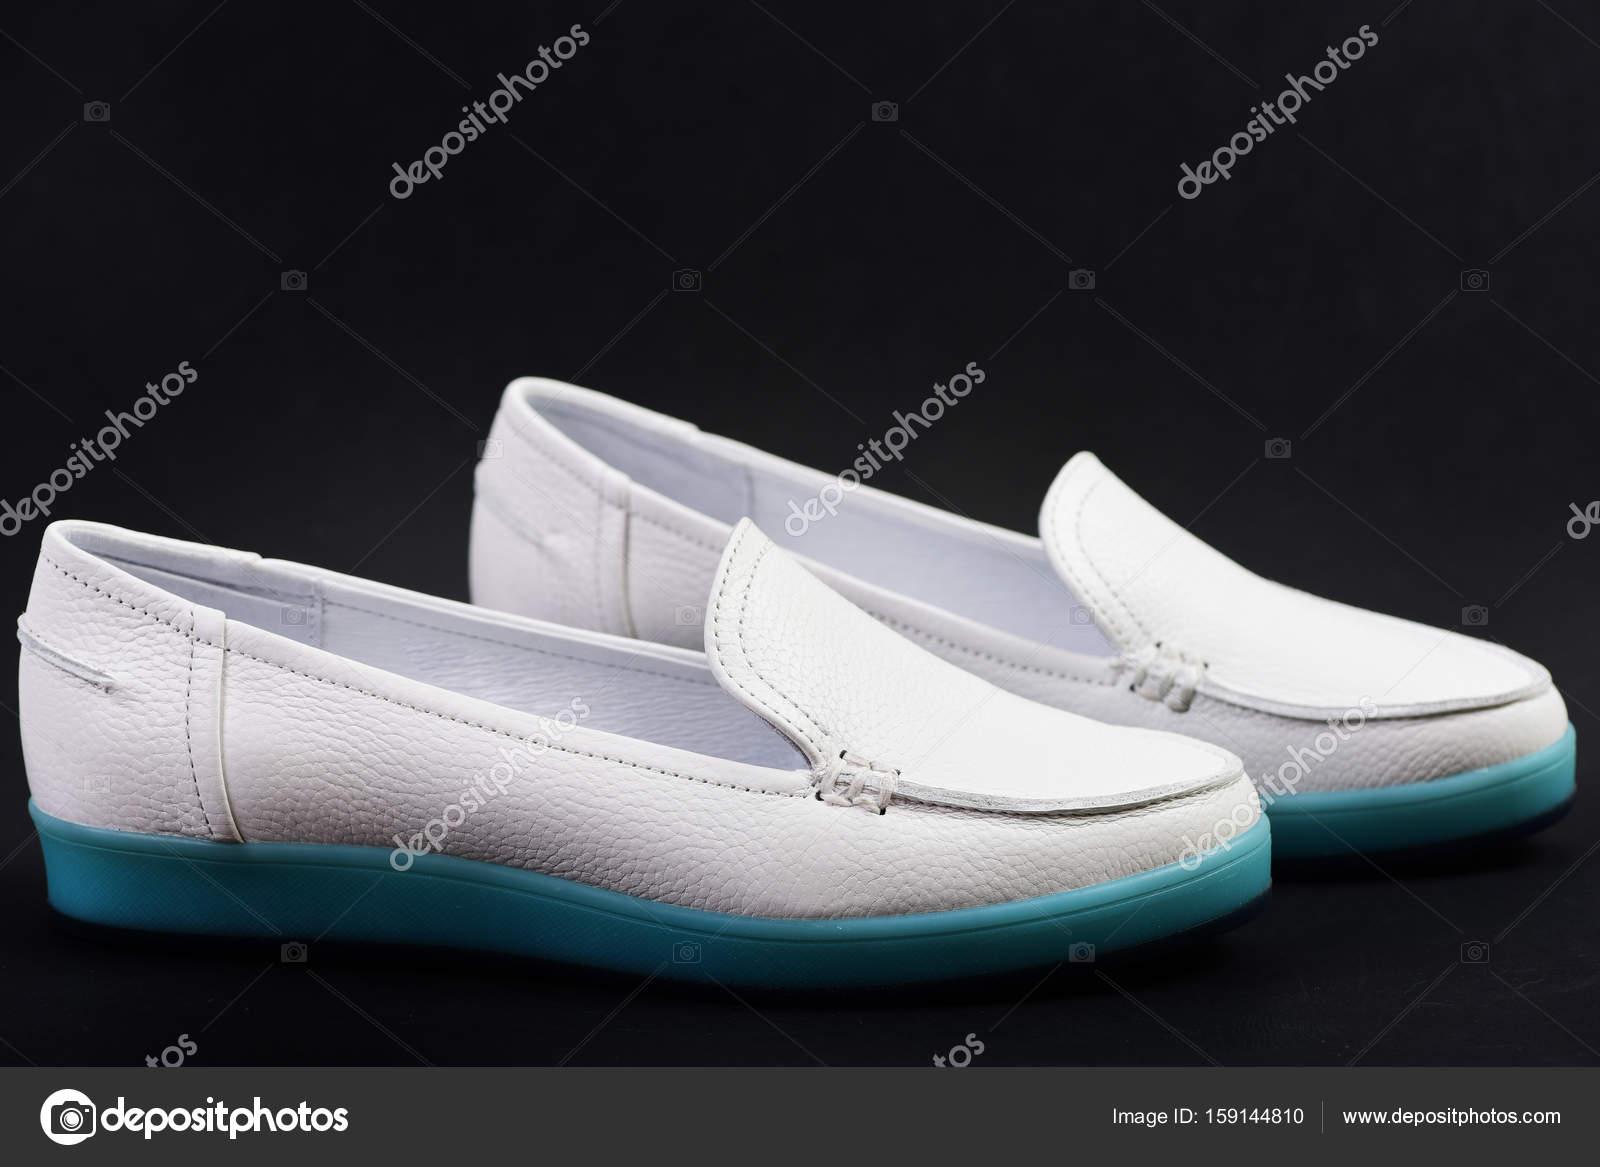 24a5497d3bb Ζευγάρι γυναικεία παπούτσια που απομονώνονται σε μπλε ή μαύρο φόντο ...